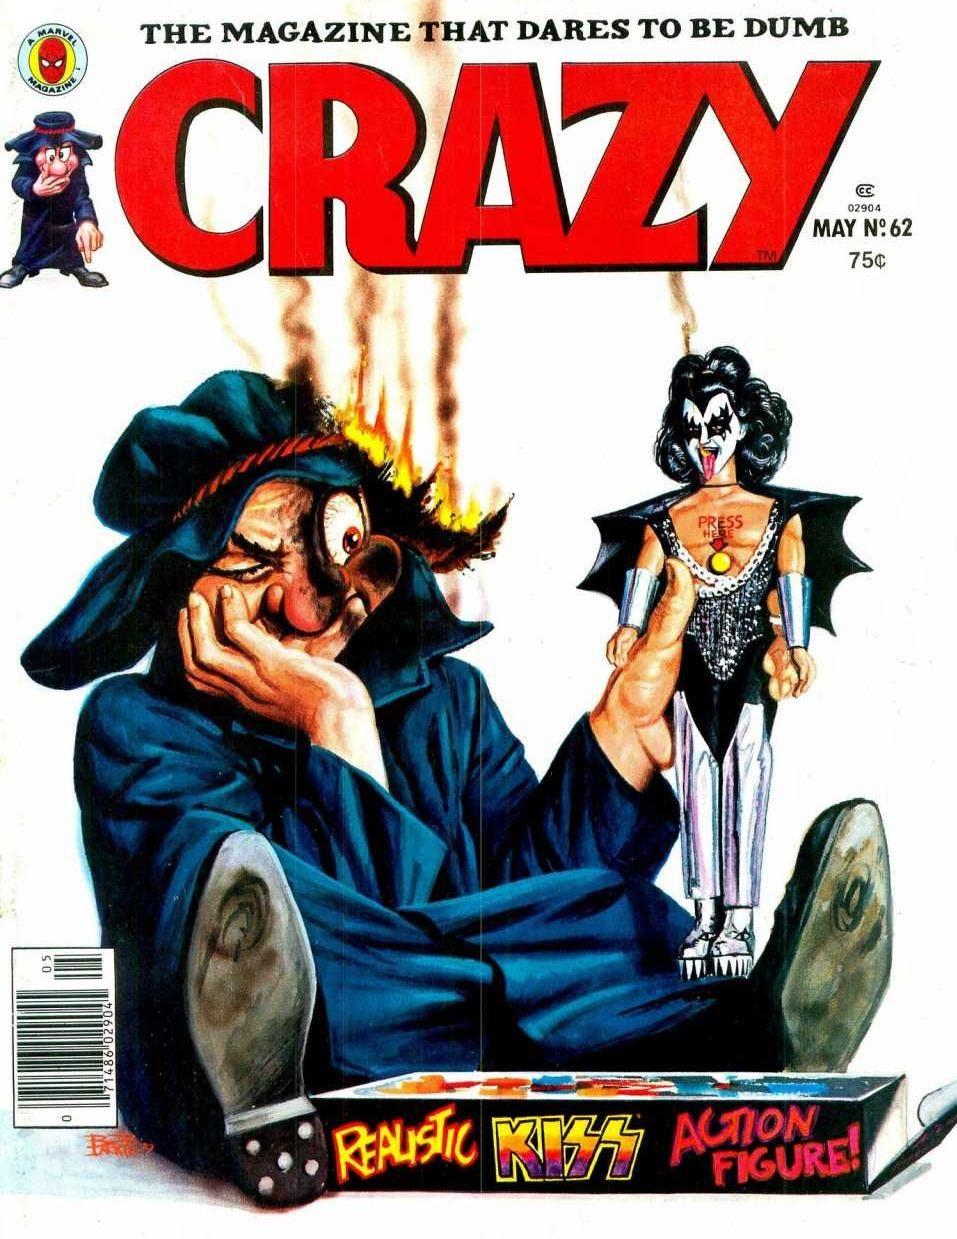 RECORTES DE PRENSA - Página 5 Kiss_crazy_2